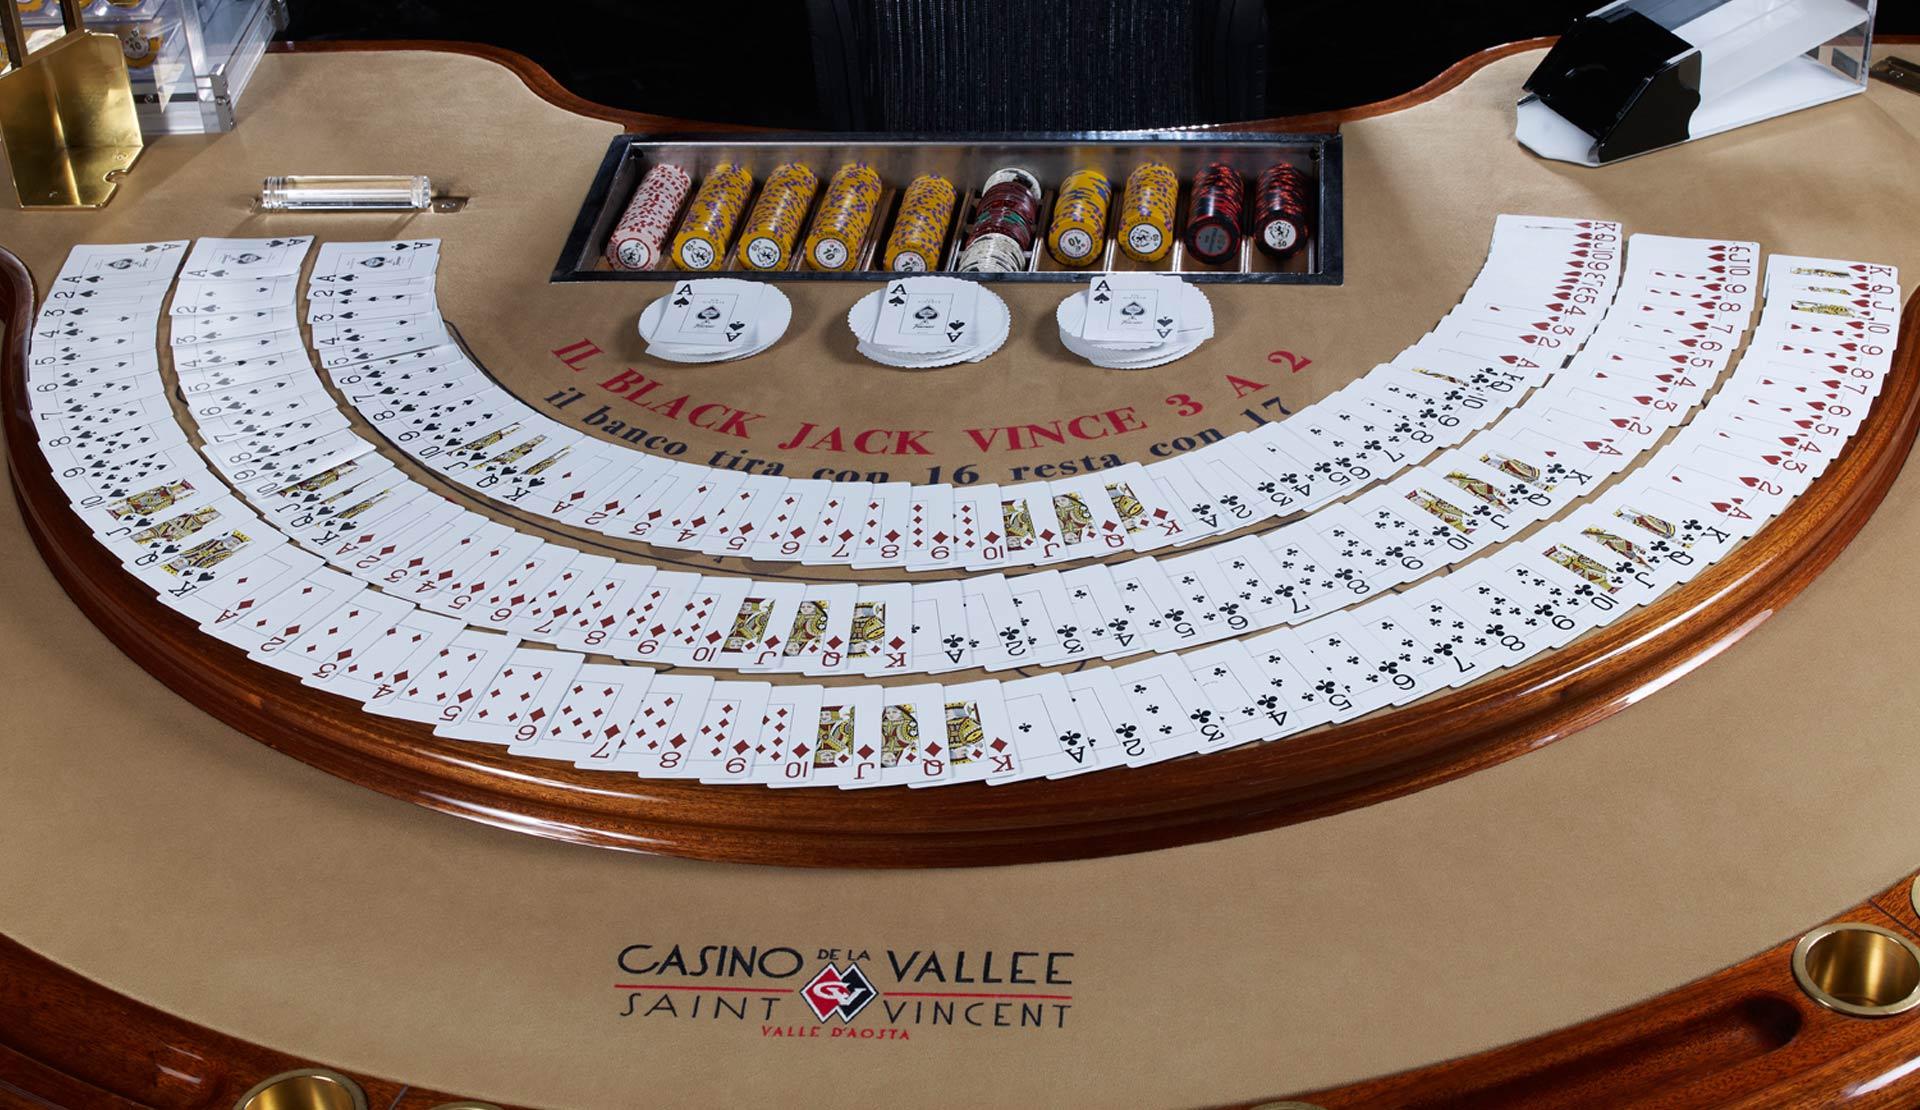 black jack casino